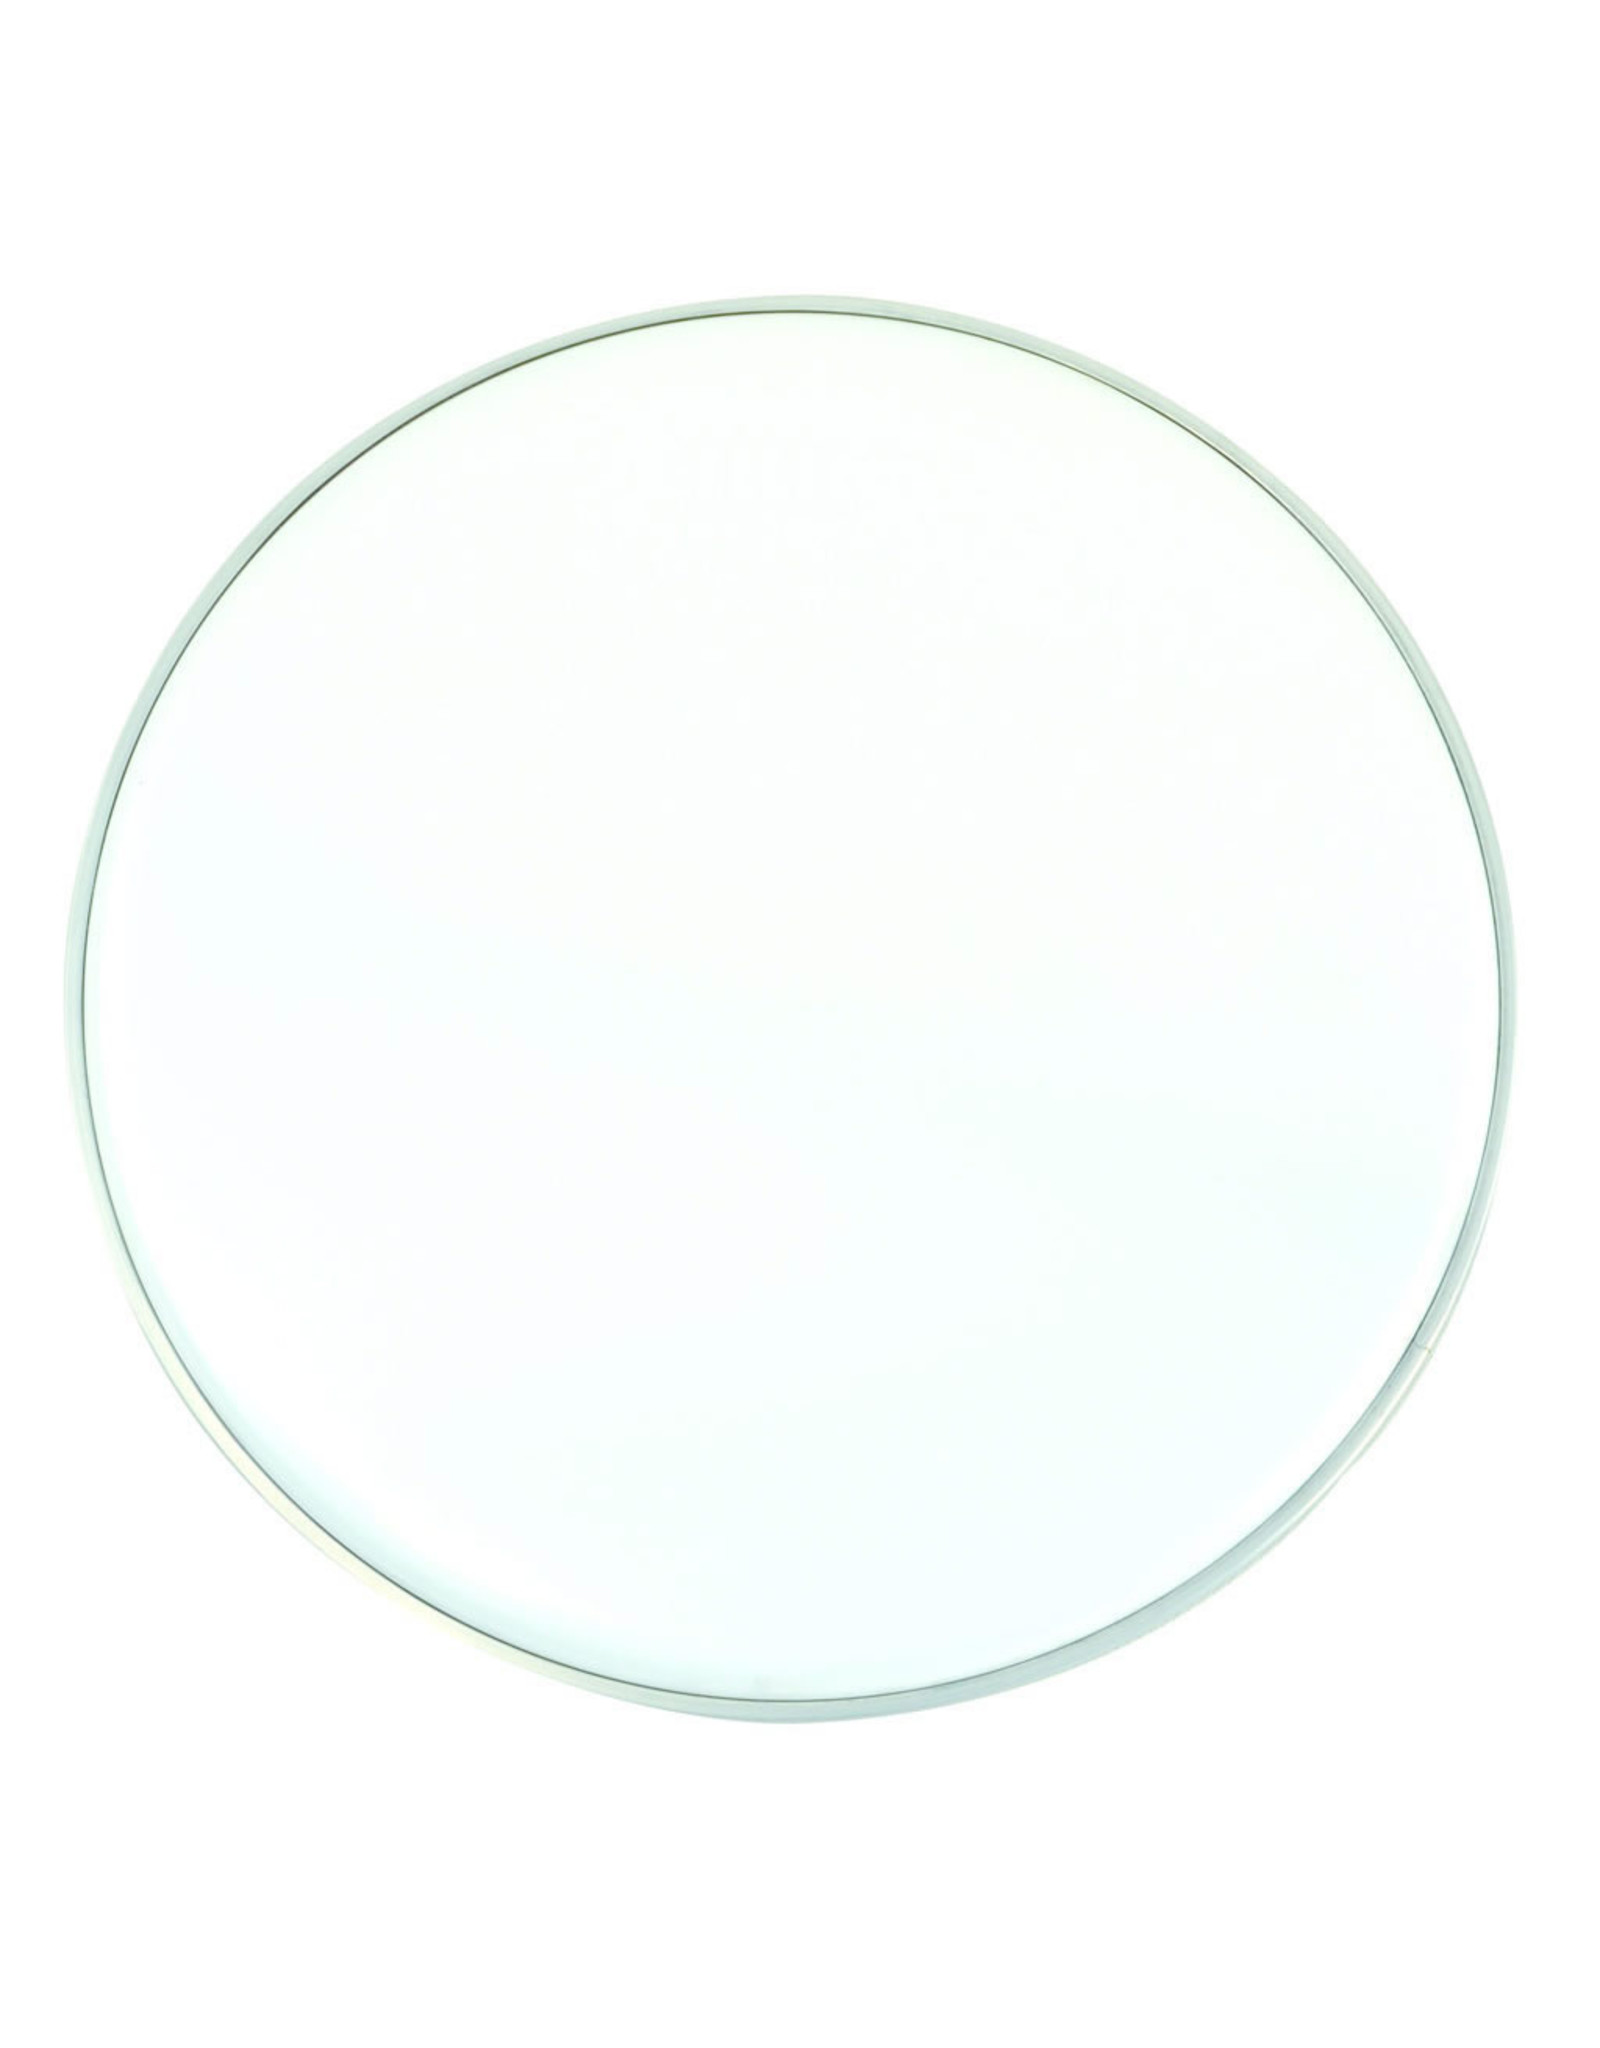 Ramm® Drumhead 12 Inch | Transparent | Resonance